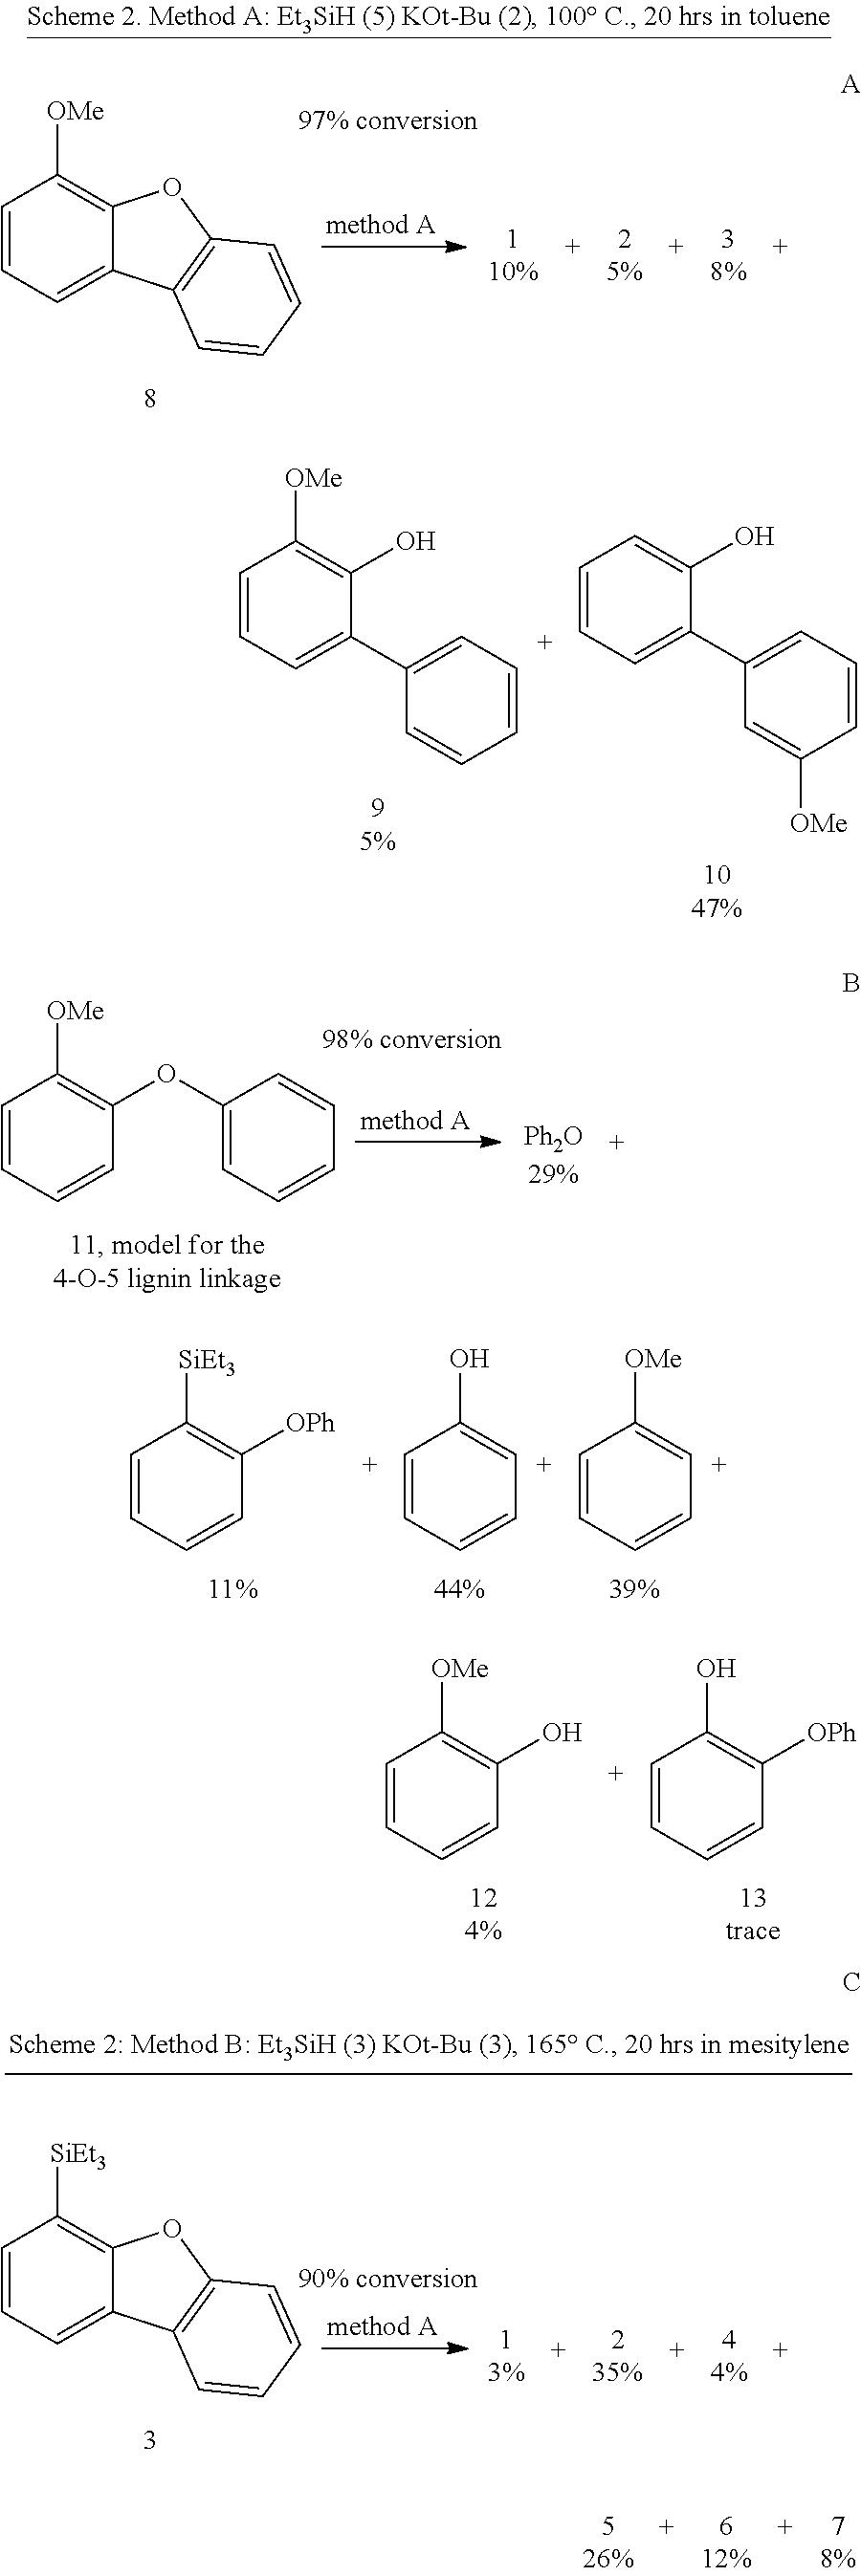 us20150166579a1 transition metal free silylation of aromatic OSI Model Layers figure us20150166579a1 20150618 c00020